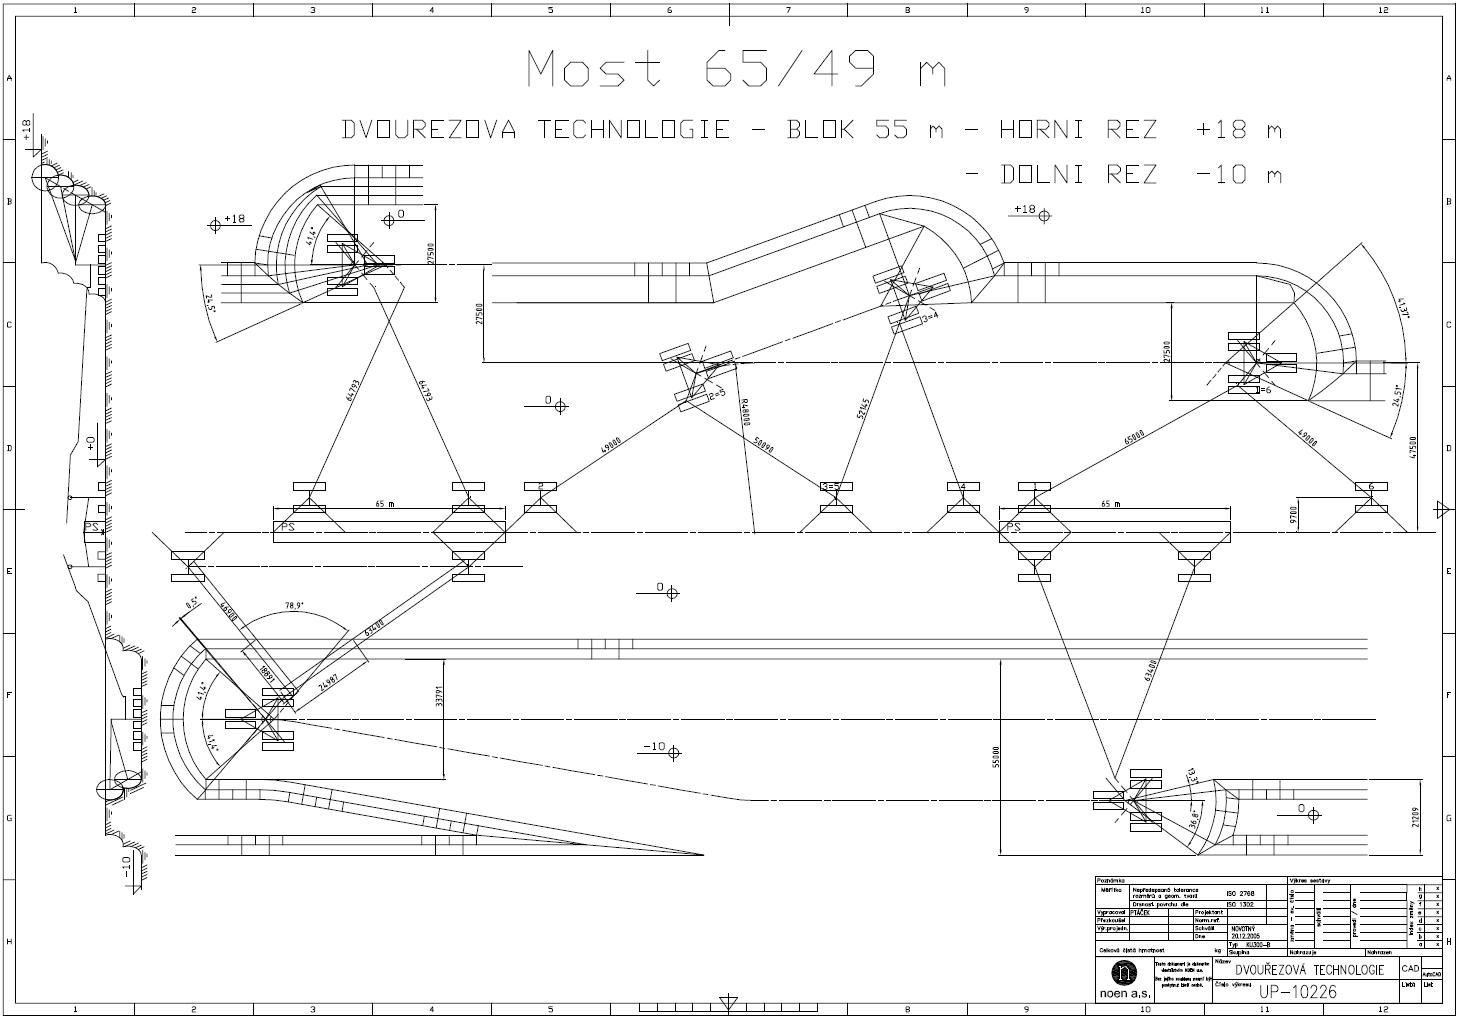 Ku300 Bucket Wheel Excavator Reconstruction Study Noen As Schematic O5 Pic01 O4